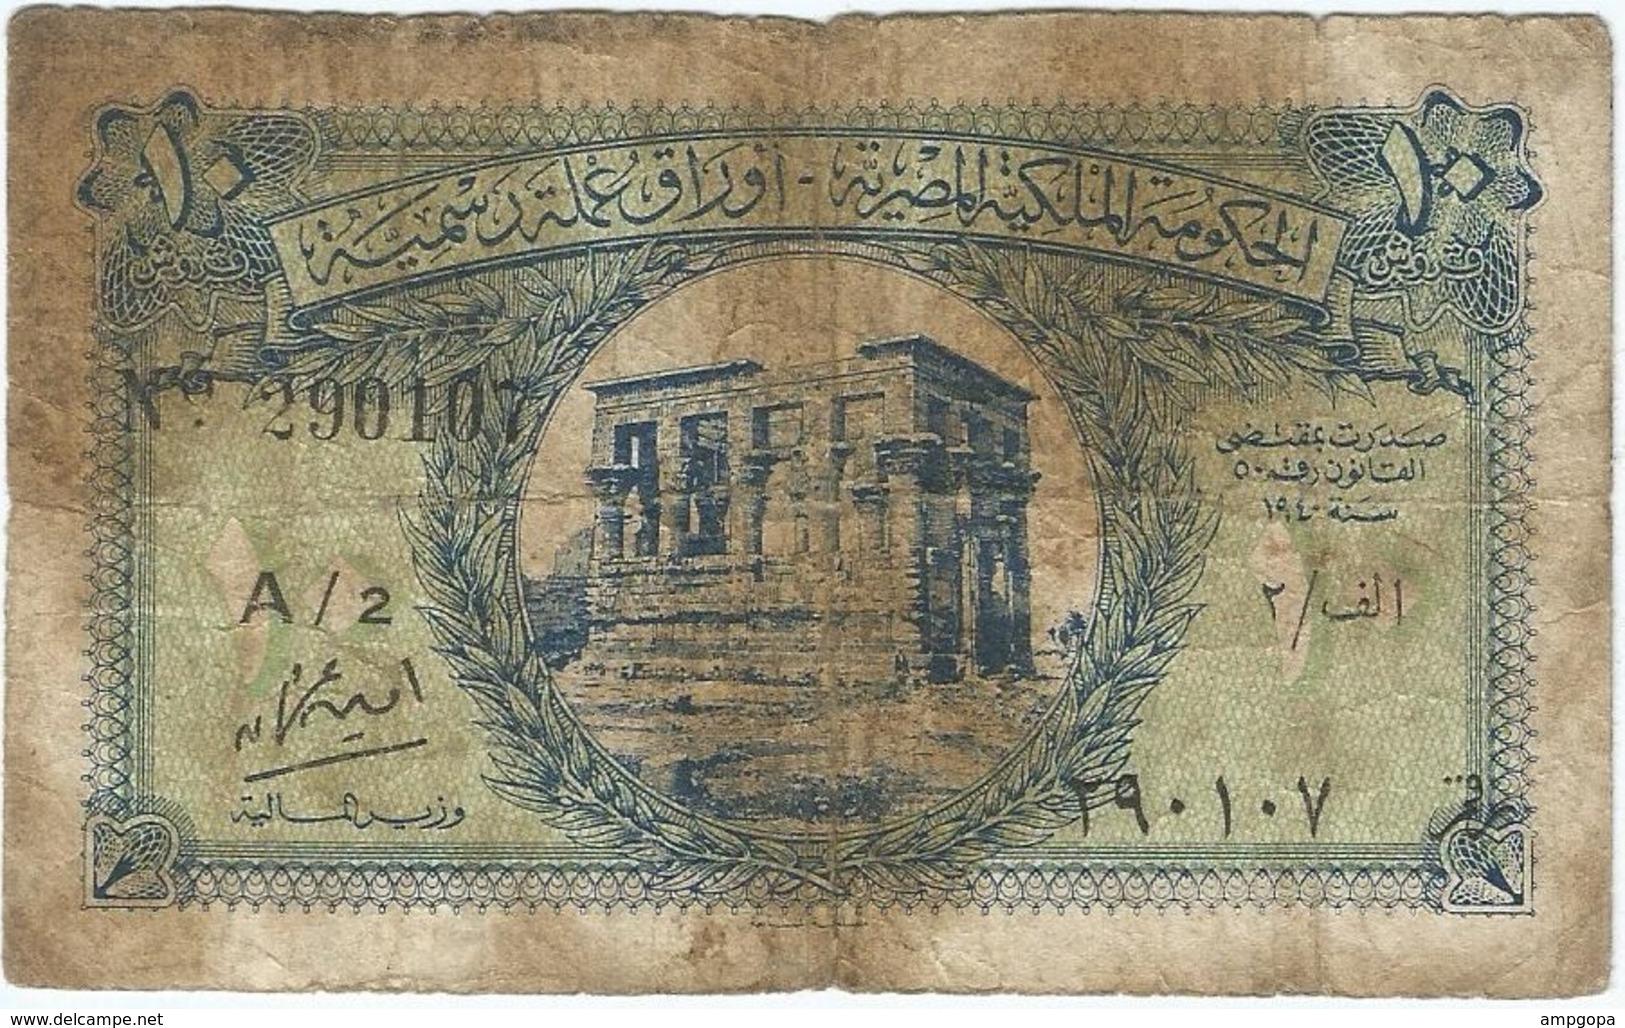 Egipto - Egypt 10 Piastres 1940 Pk 167 B Serie Fraccional Ref 18 - Egipto